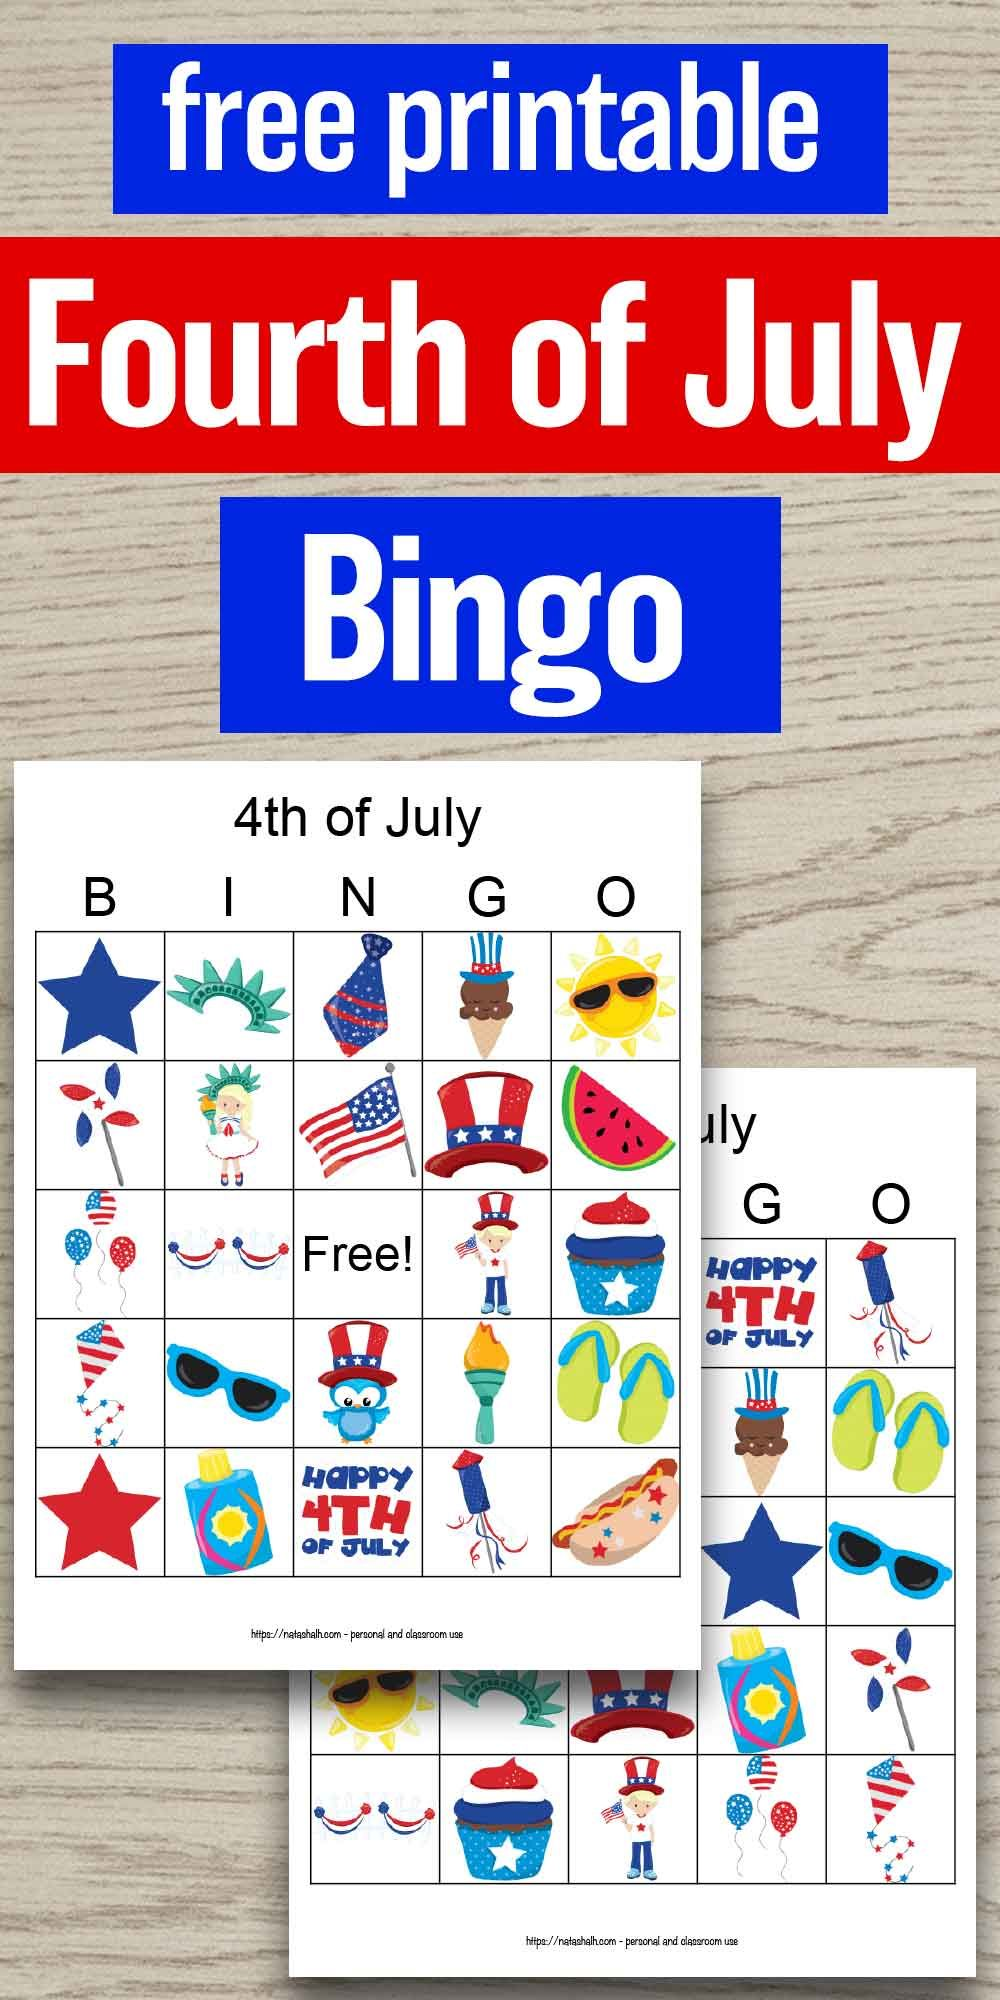 Free Printable Fourth Of July Bingo Business For Kids Fourth Of July Free Printables [ 2000 x 1000 Pixel ]